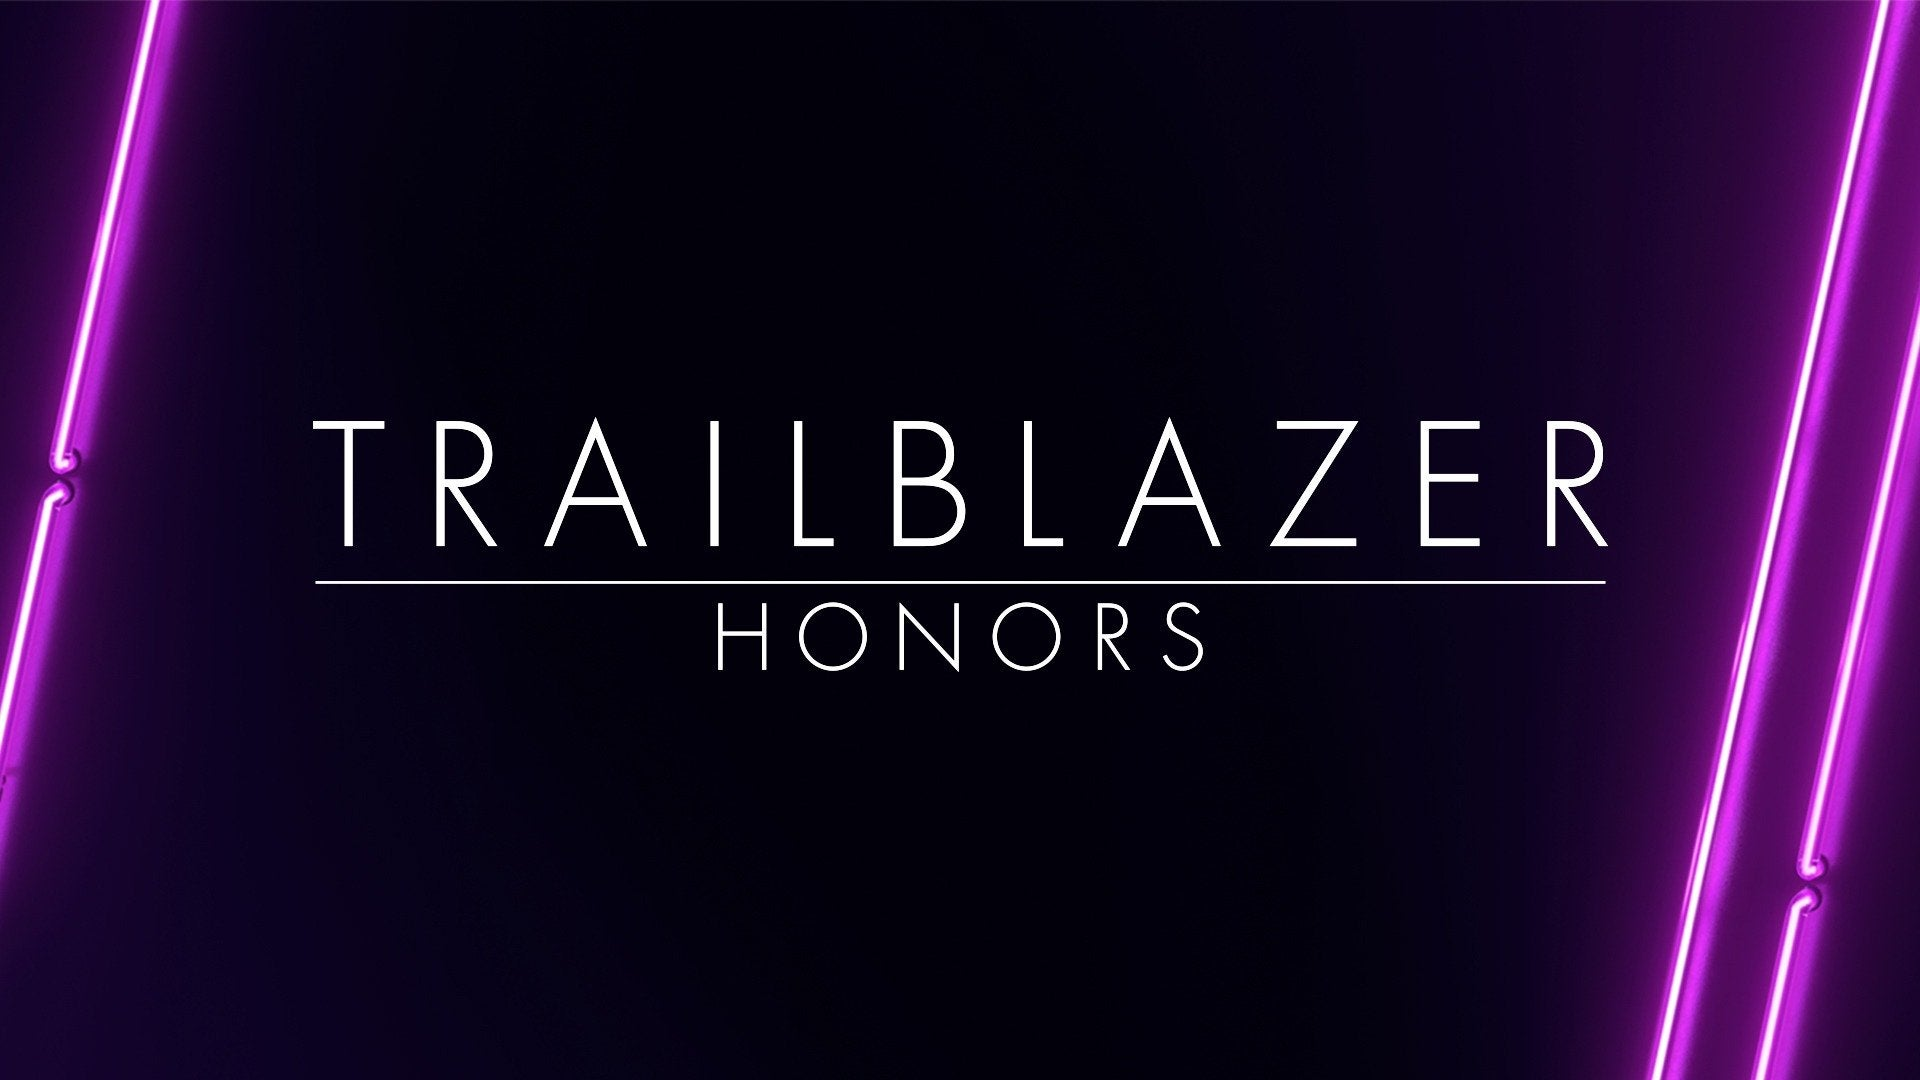 VH1 Trailblazer Honors 2018